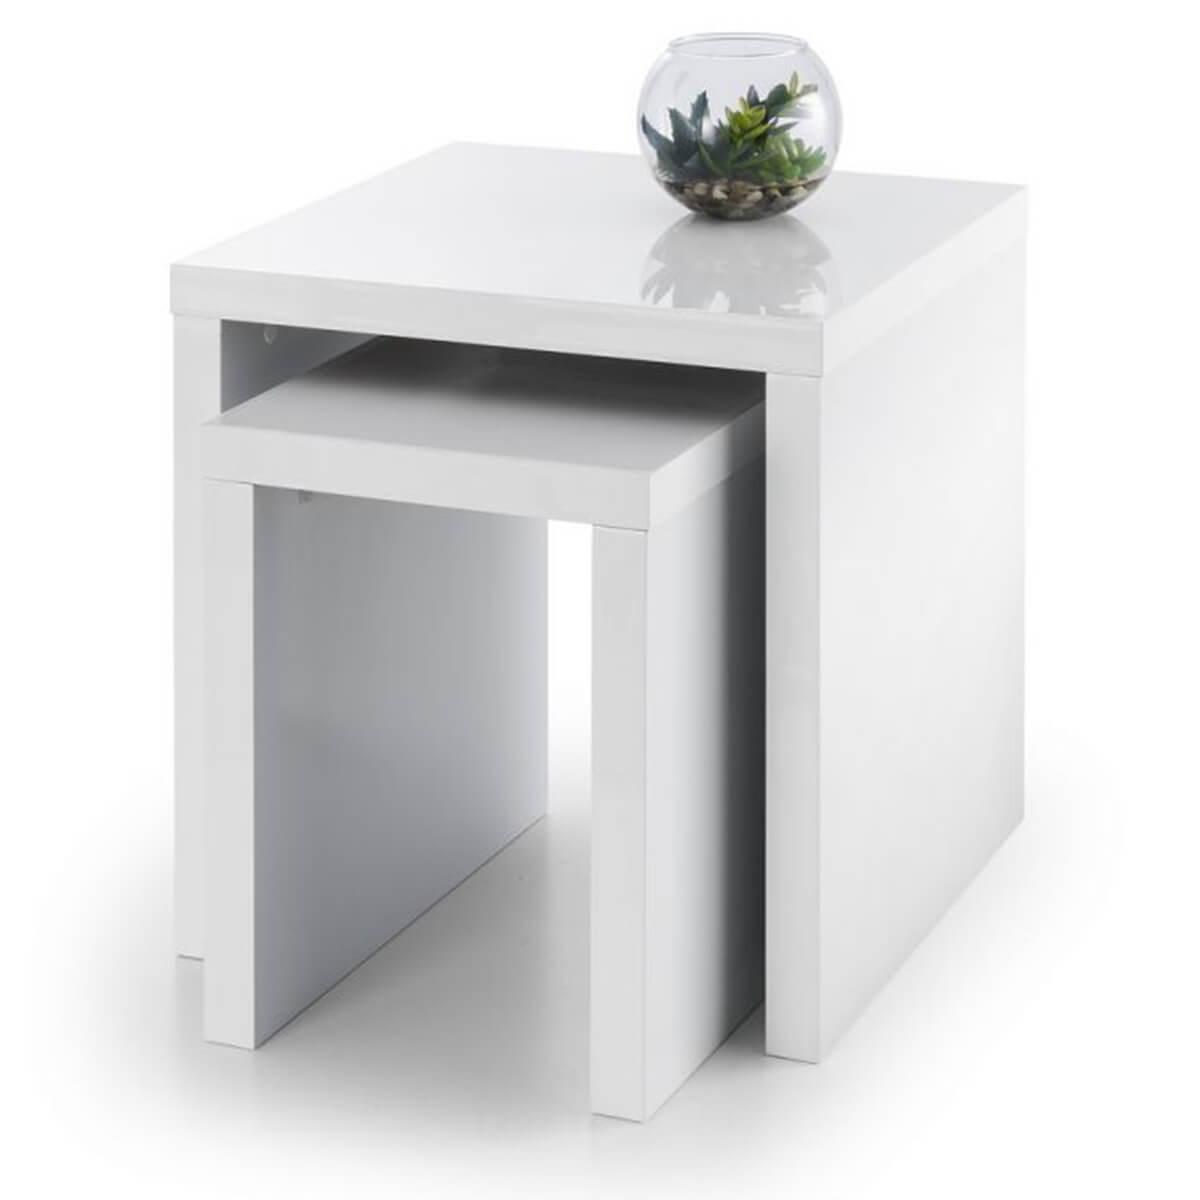 London Nest of 2 Tables White/Black High Gloss (Table Colour: White)